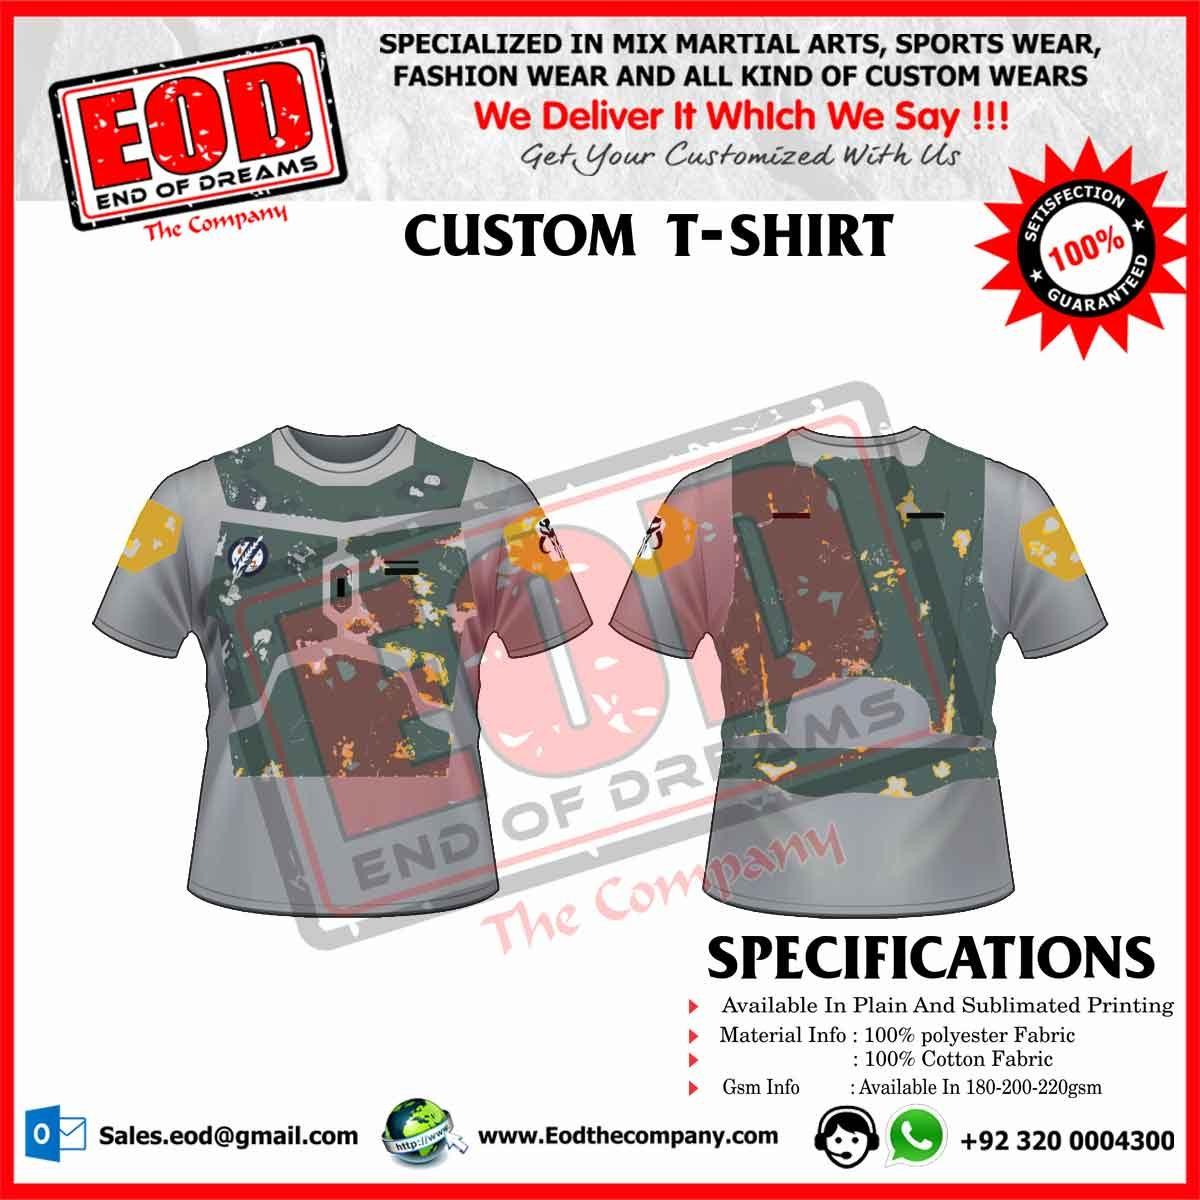 Custom T-Shirts - EOD The Company